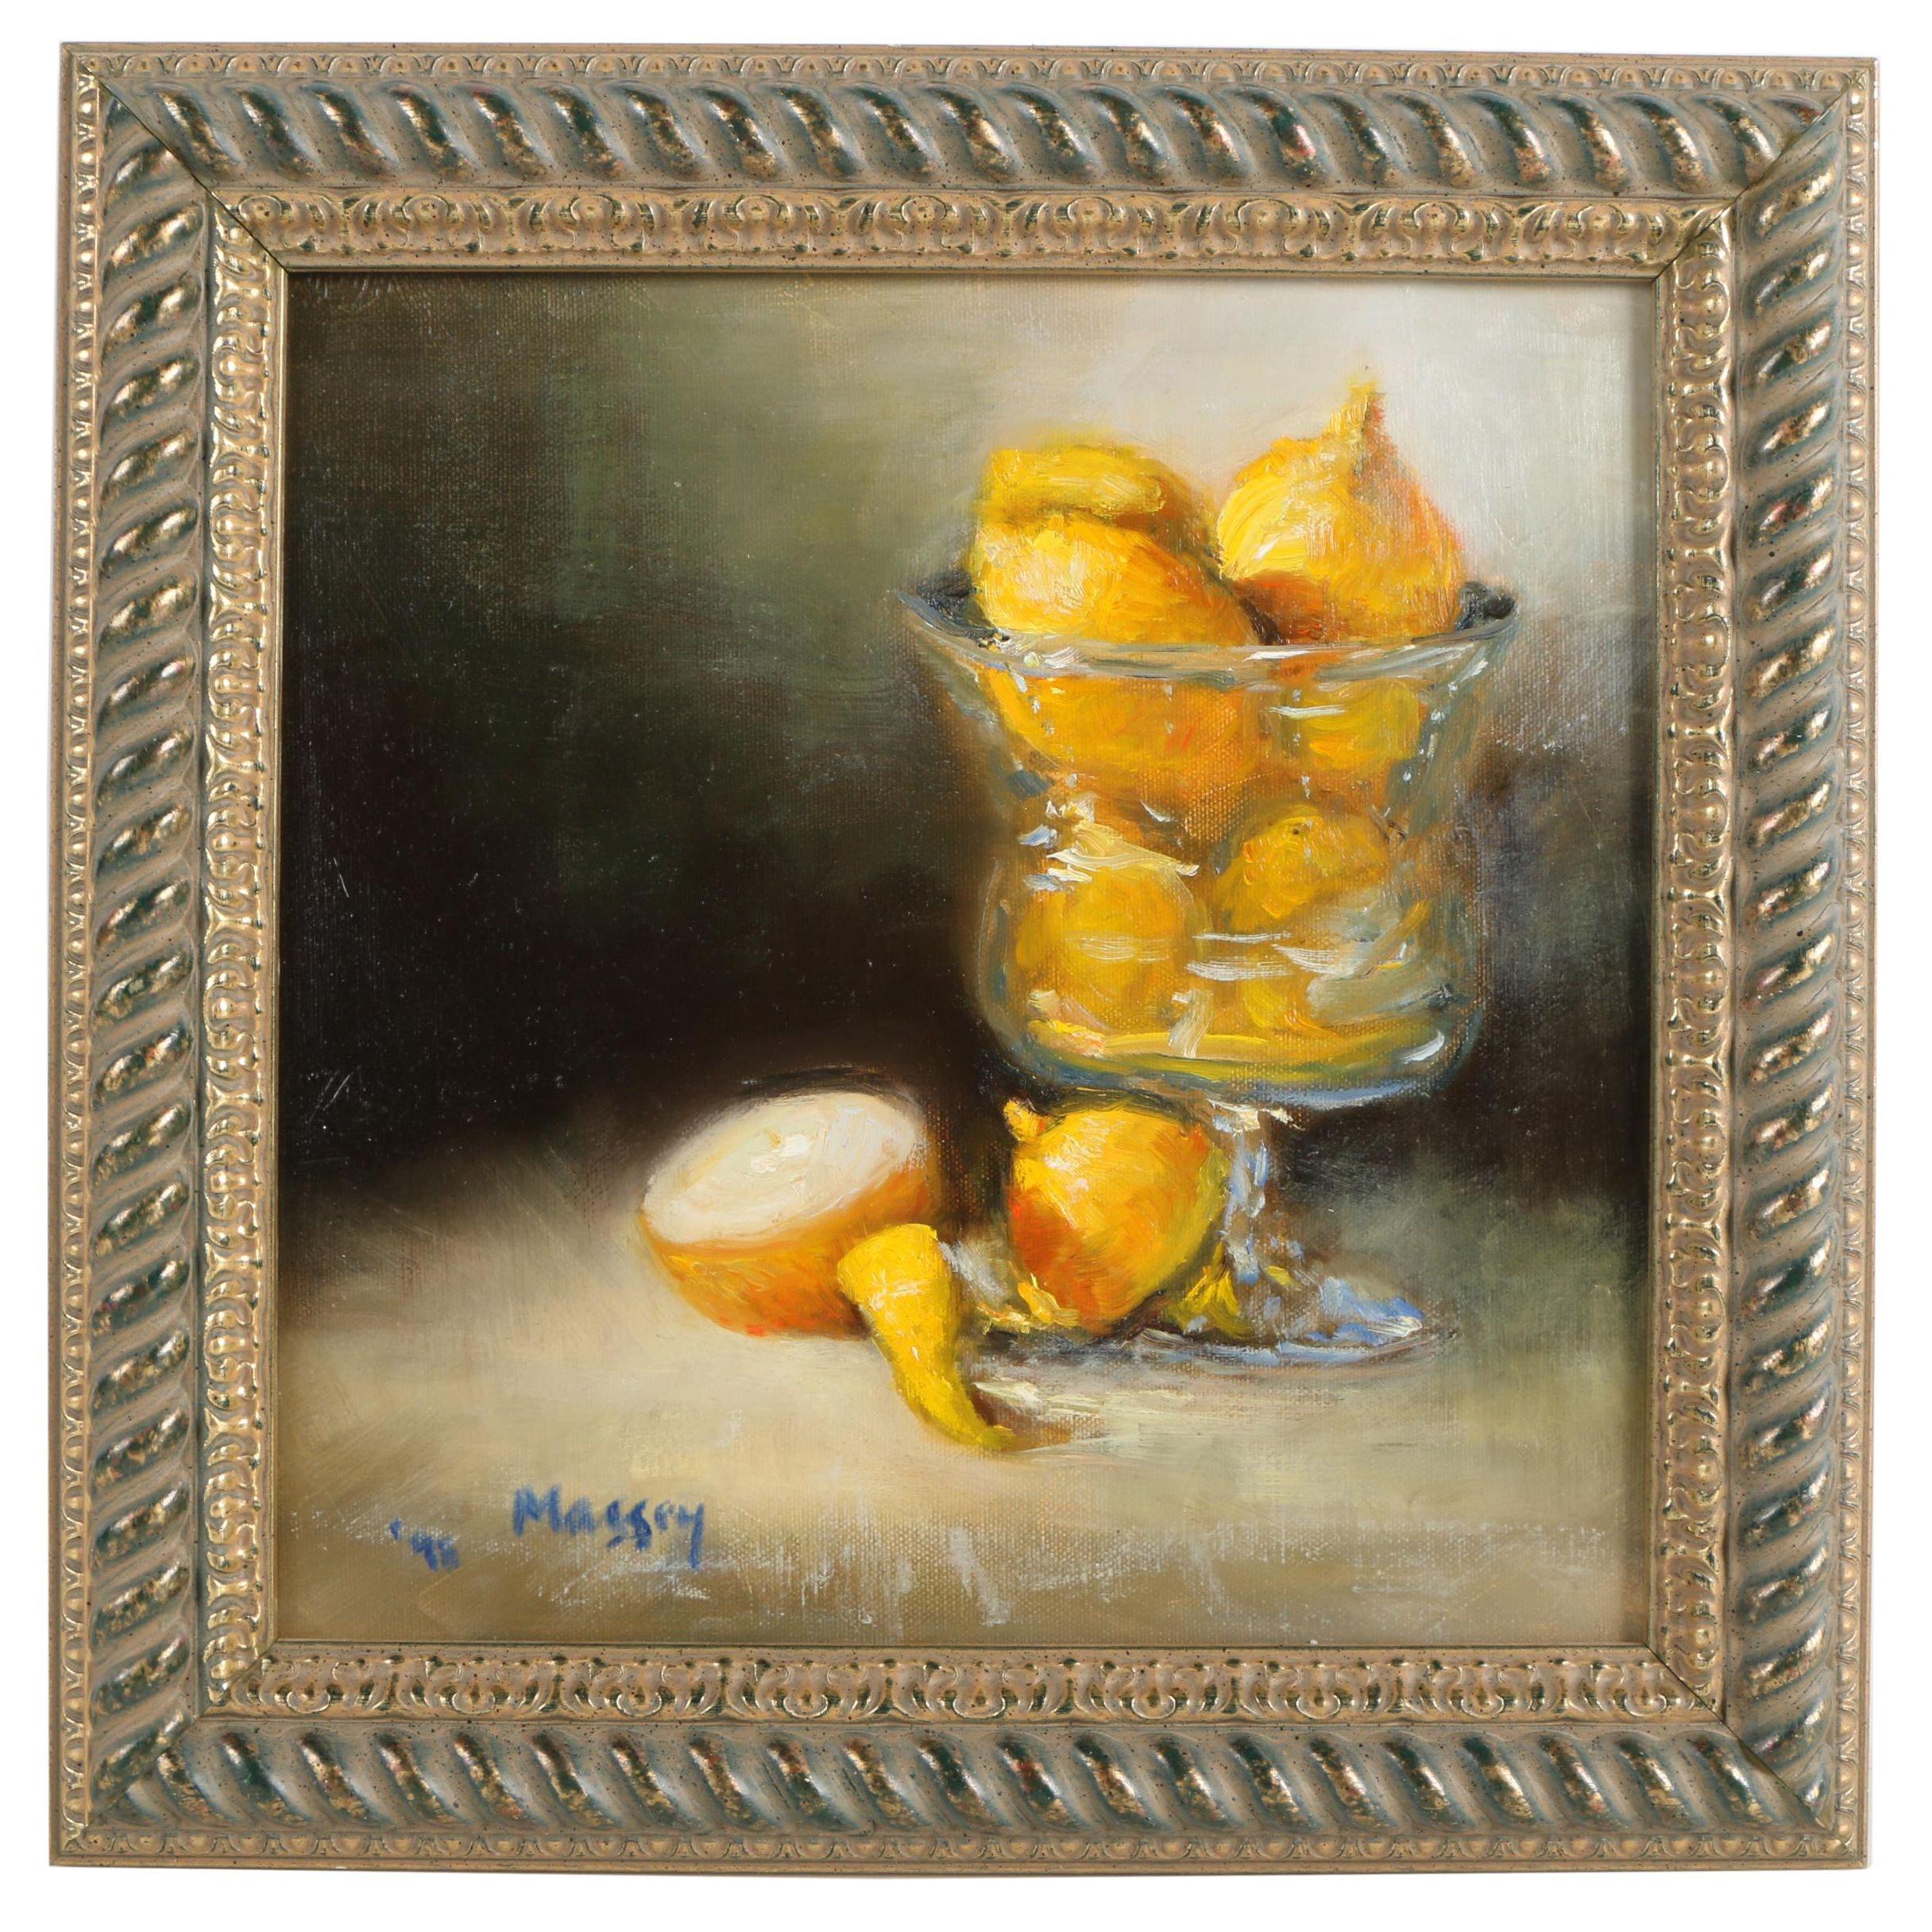 M. Kathryn 1998 Massey Oil Painting